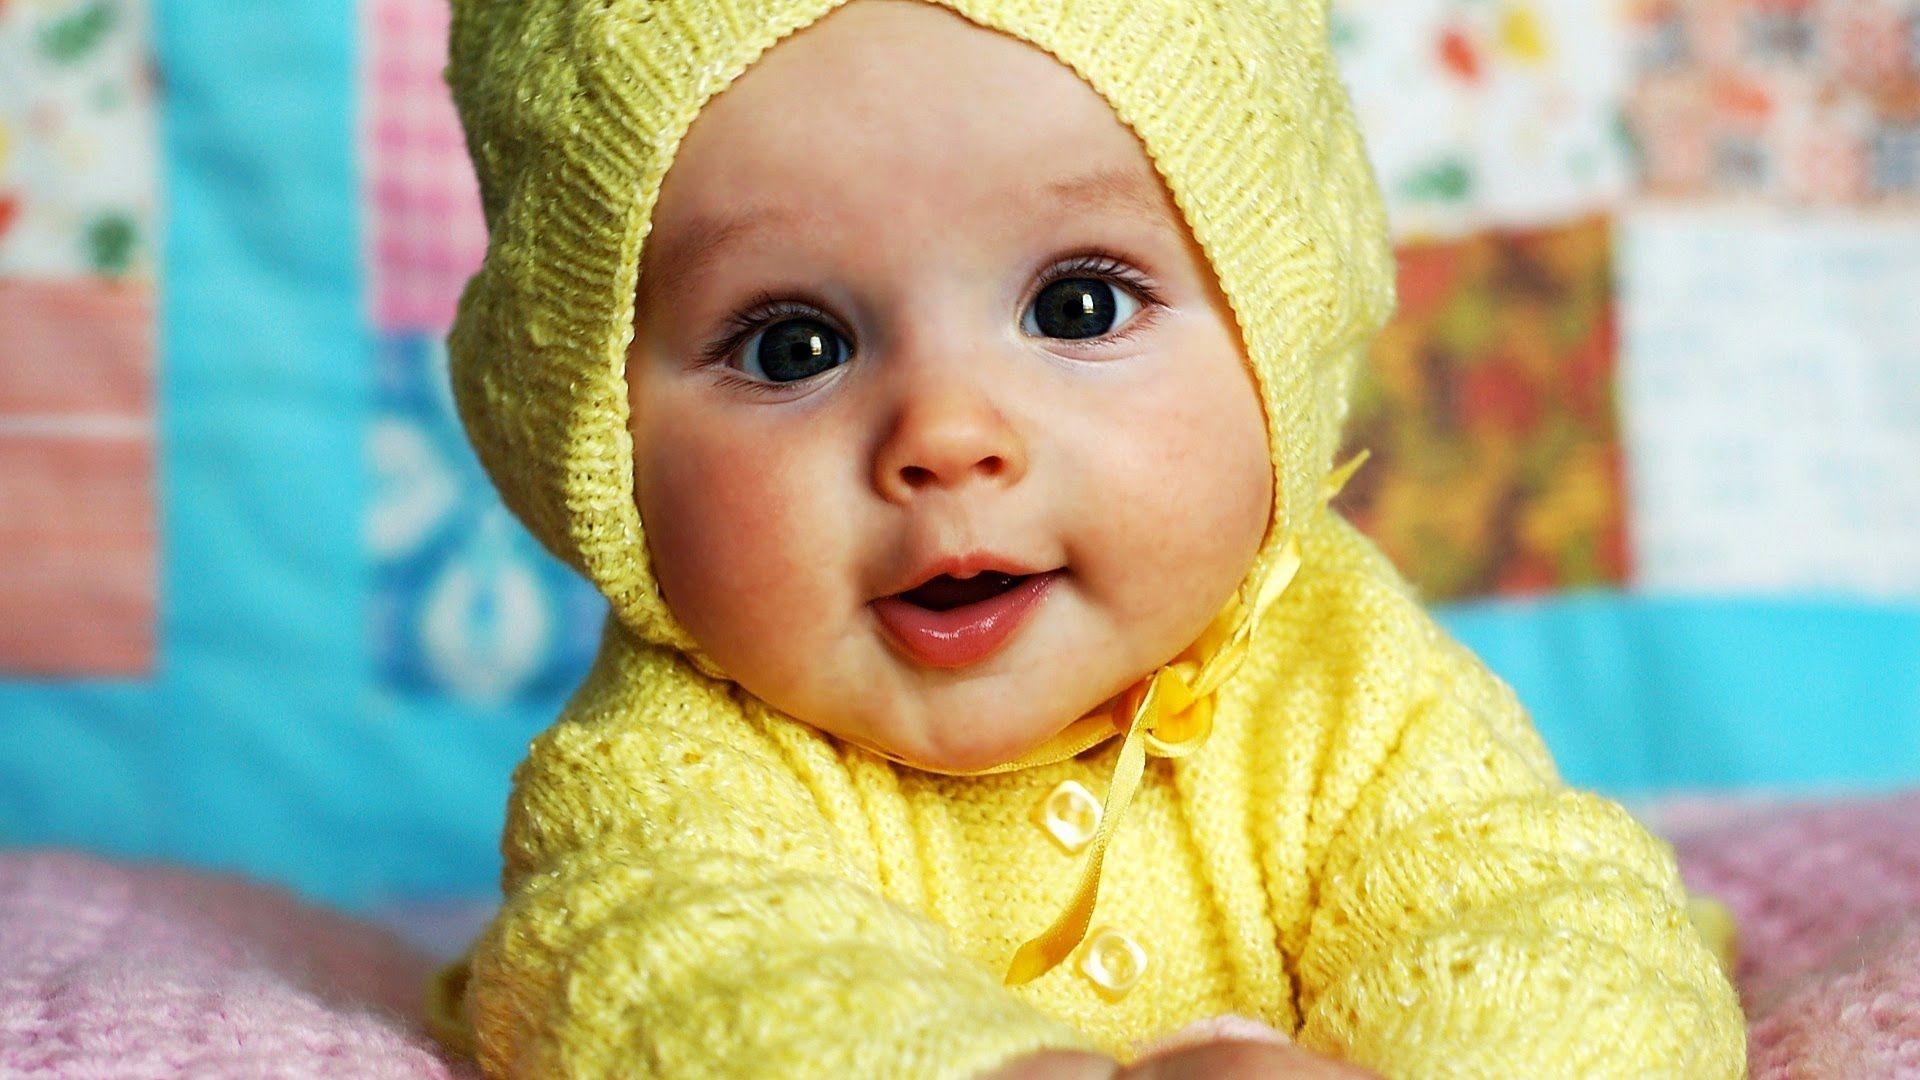 Stylish Baby Boy Wallpaper Baby Wall 1920x1080